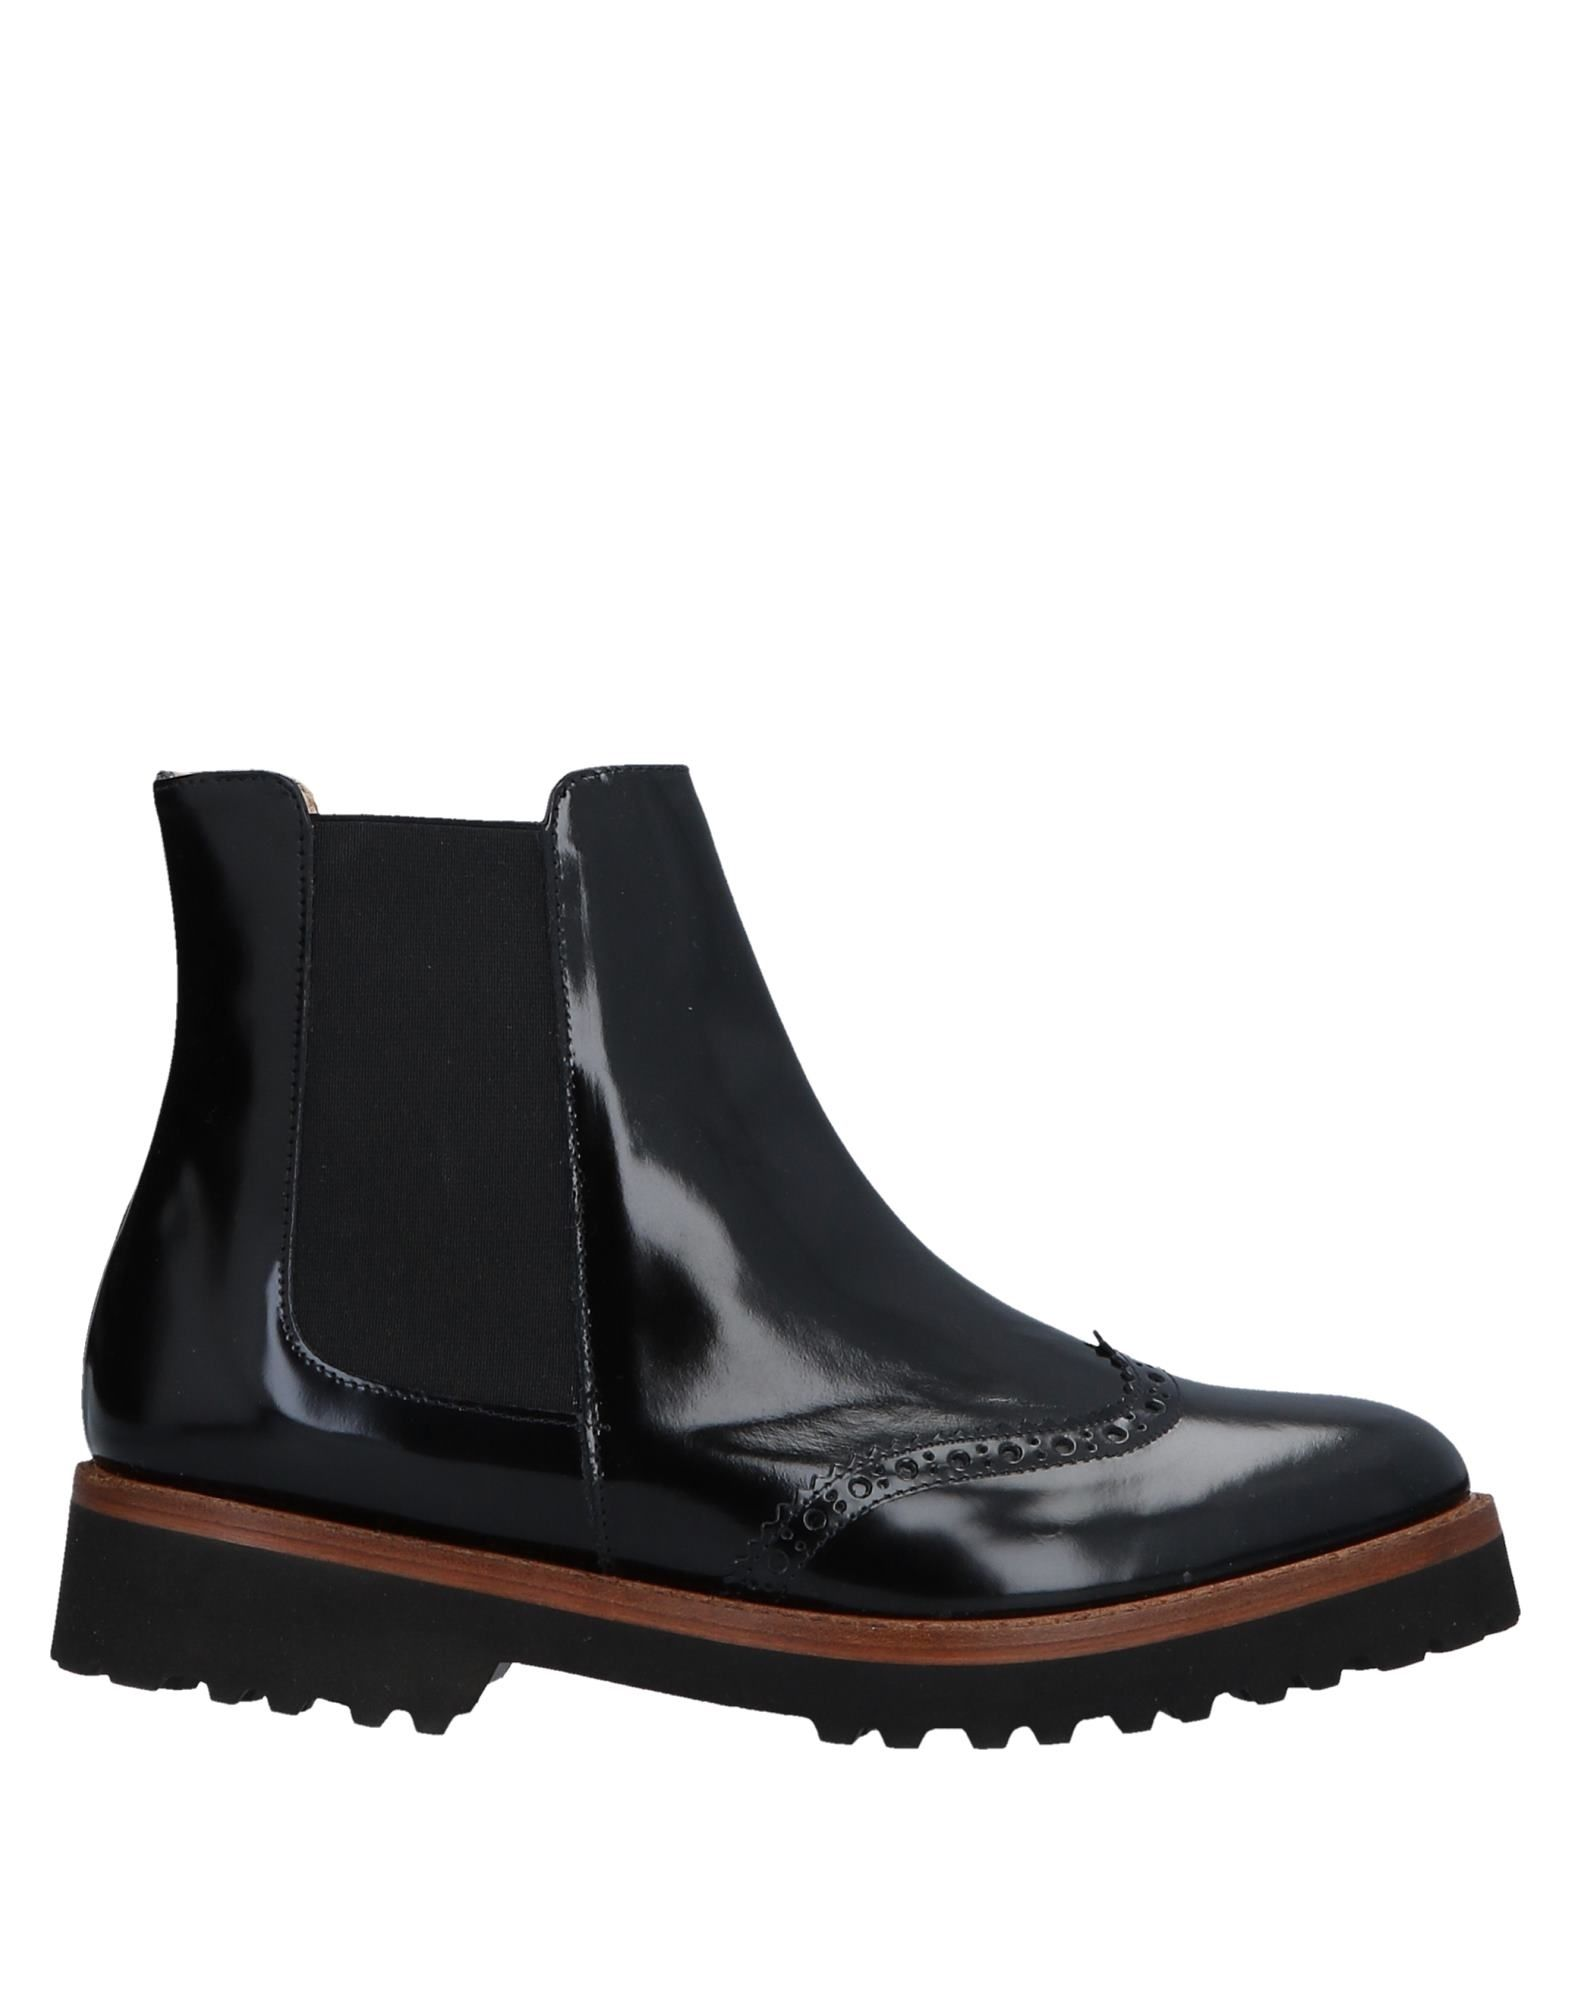 Chelsea Boots Fabio Fabio Boots Rusconi Donna - 11532471RB 5d3ecb